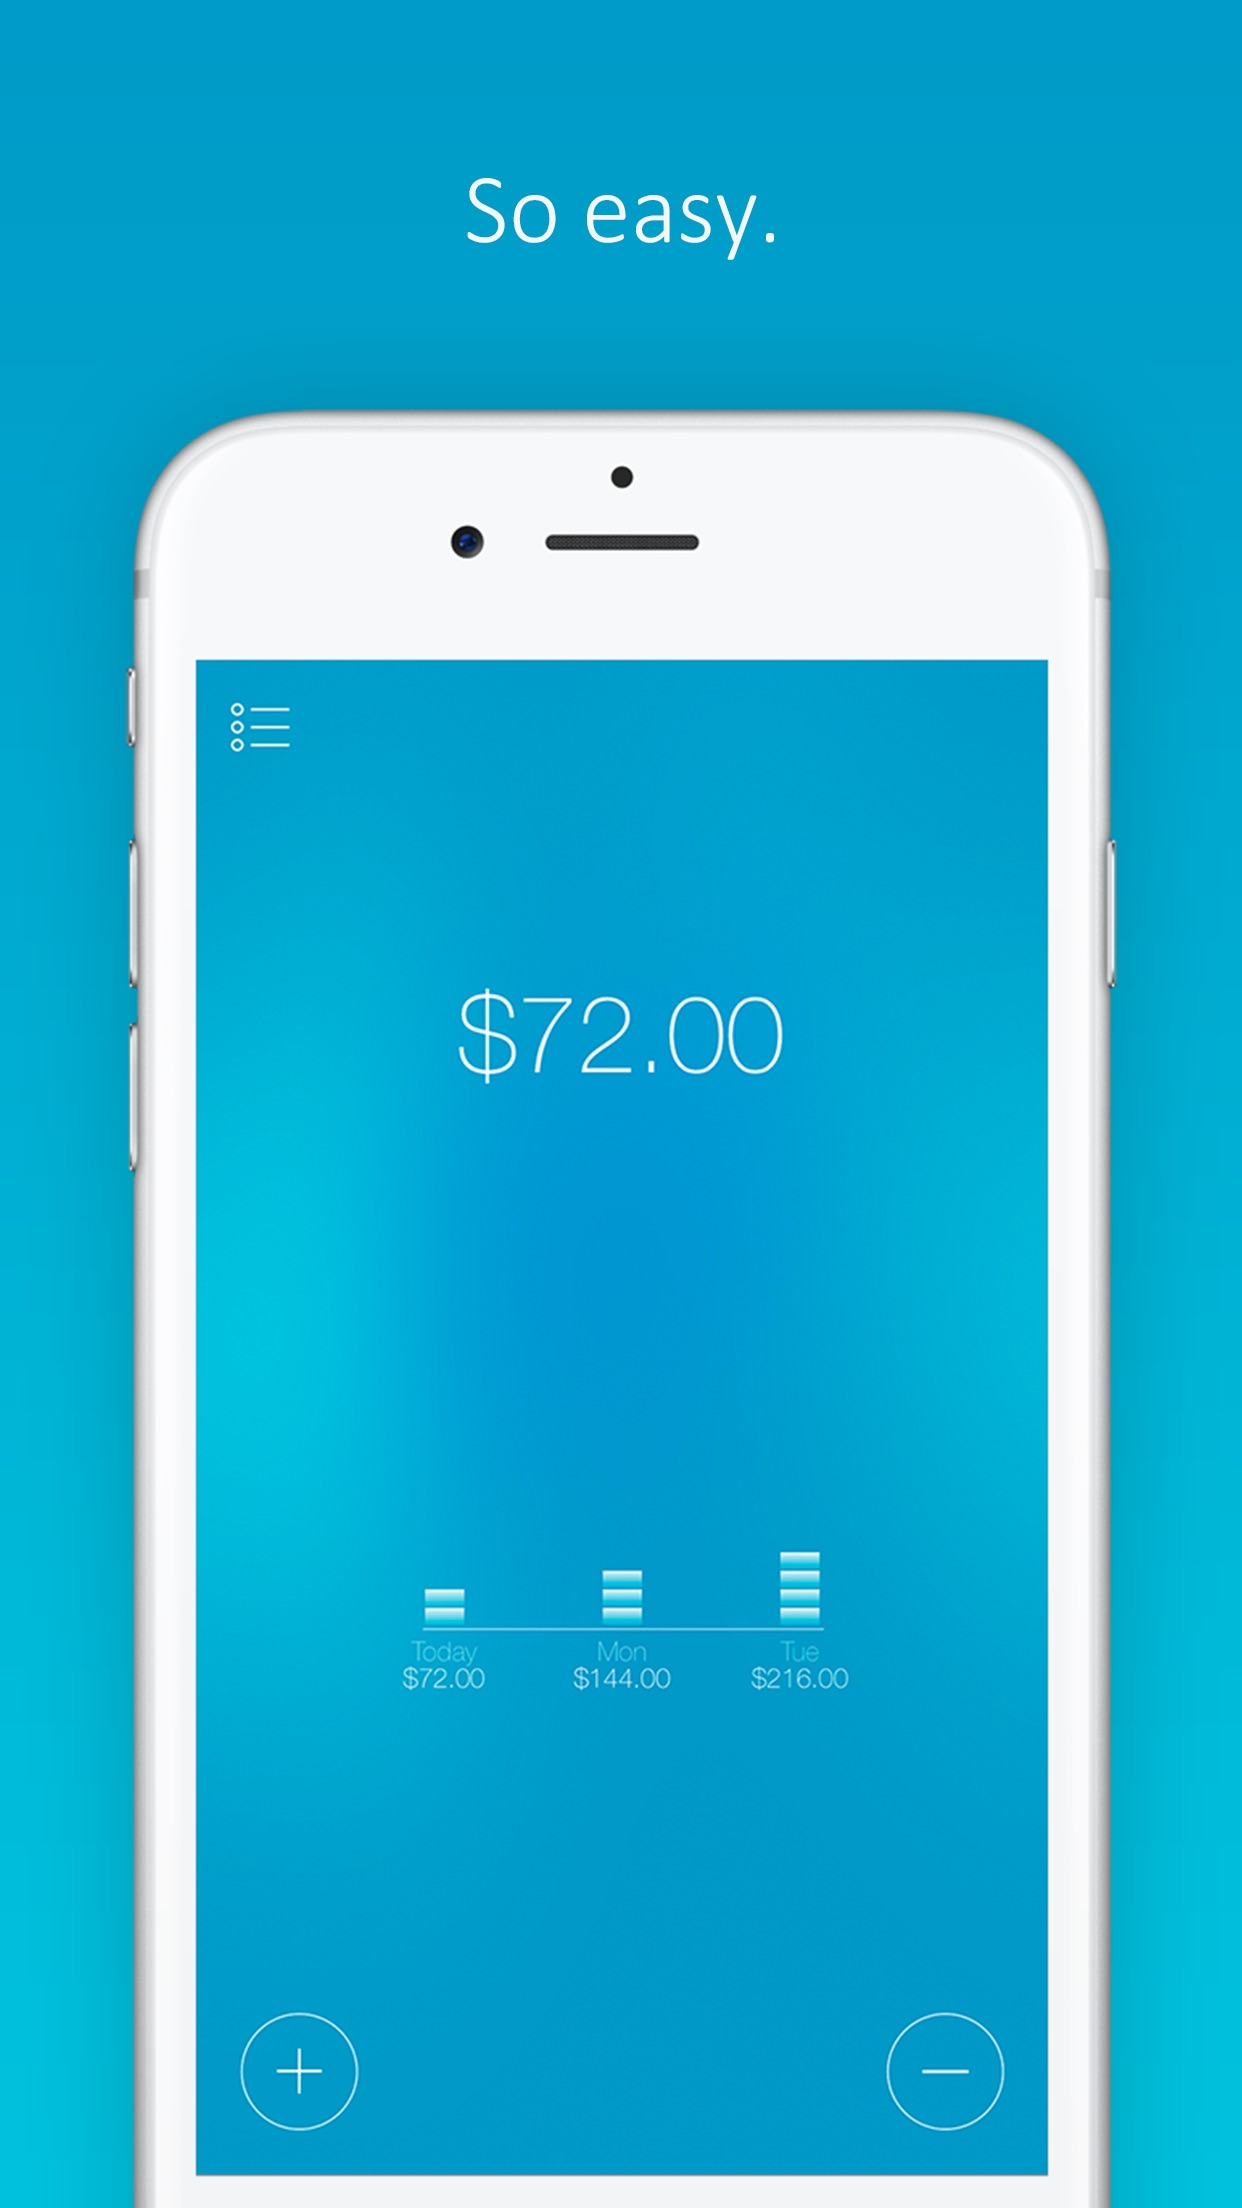 Daily Budget Original - Saving Is Fun! Screenshot